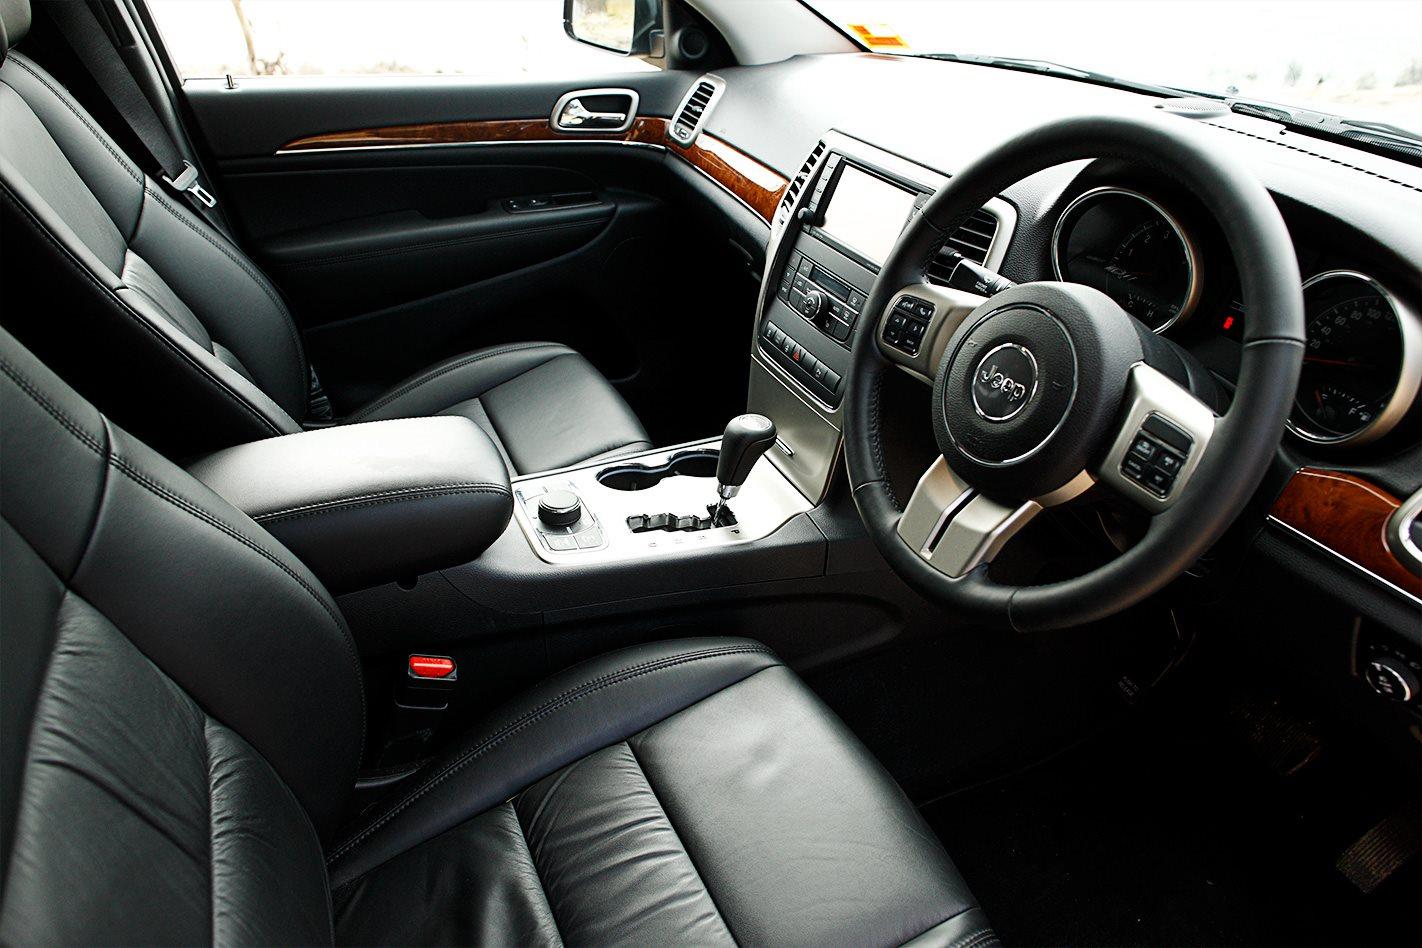 2011 Jeep Grand Cherokee interior.jpg